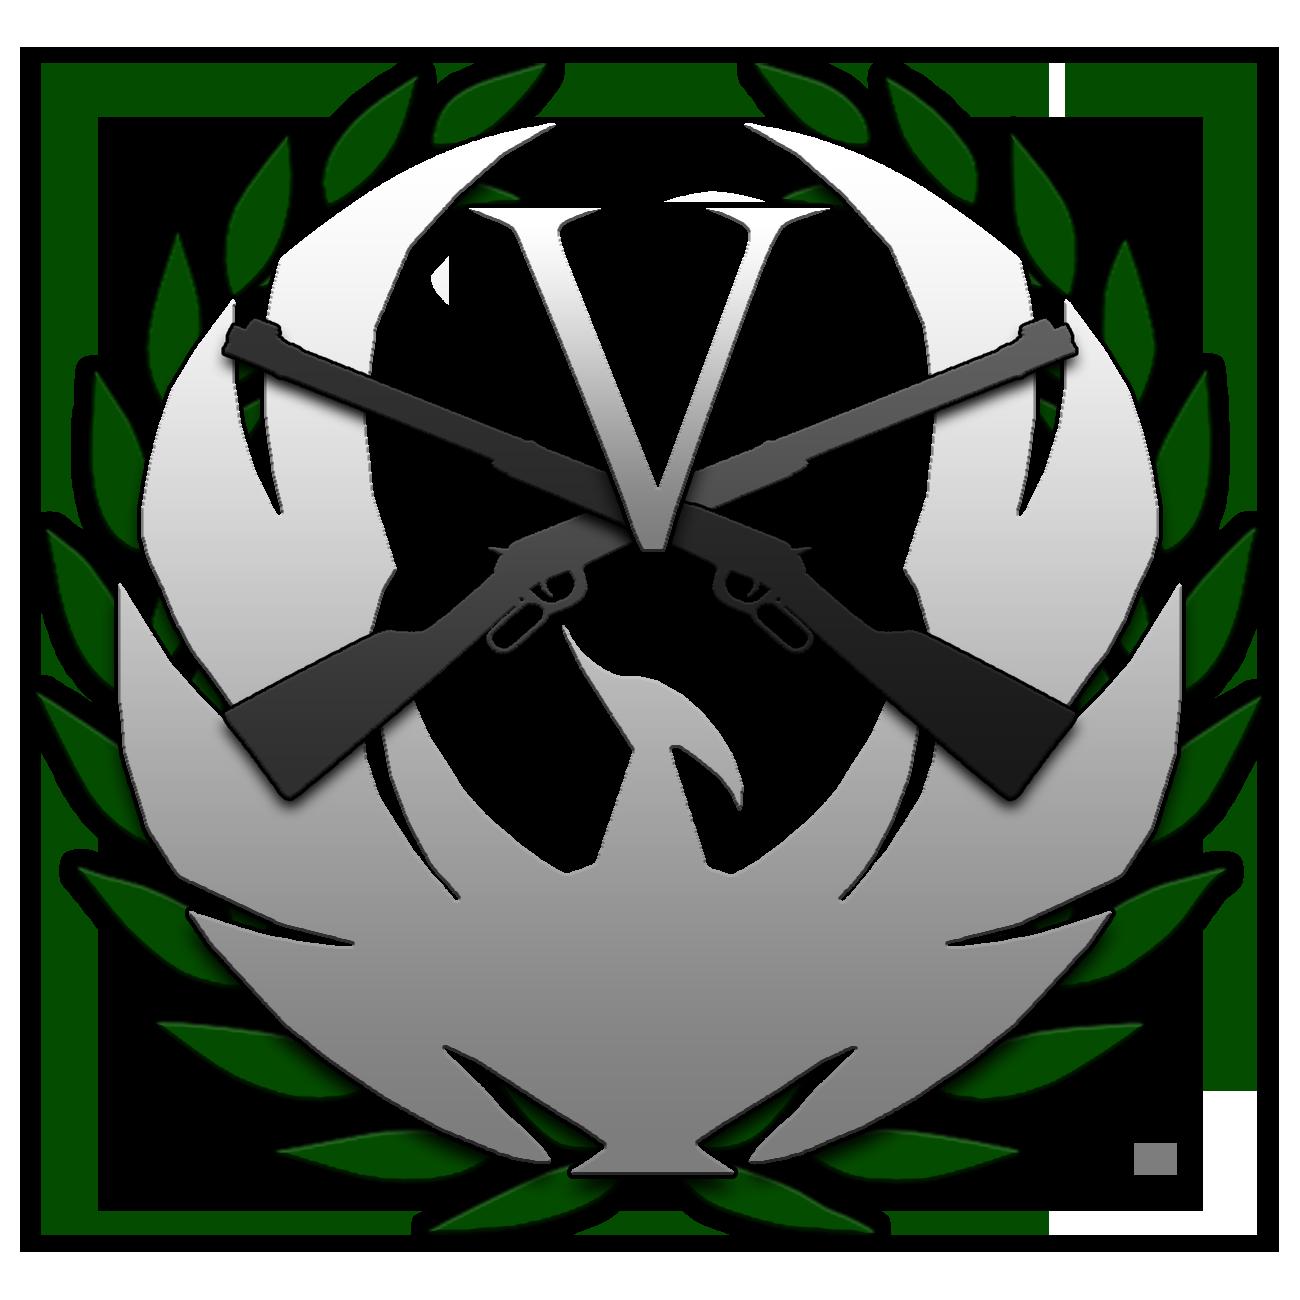 The Phoenix Brigade Roblox Urban Assault Forces Roblox Wikia Fandom